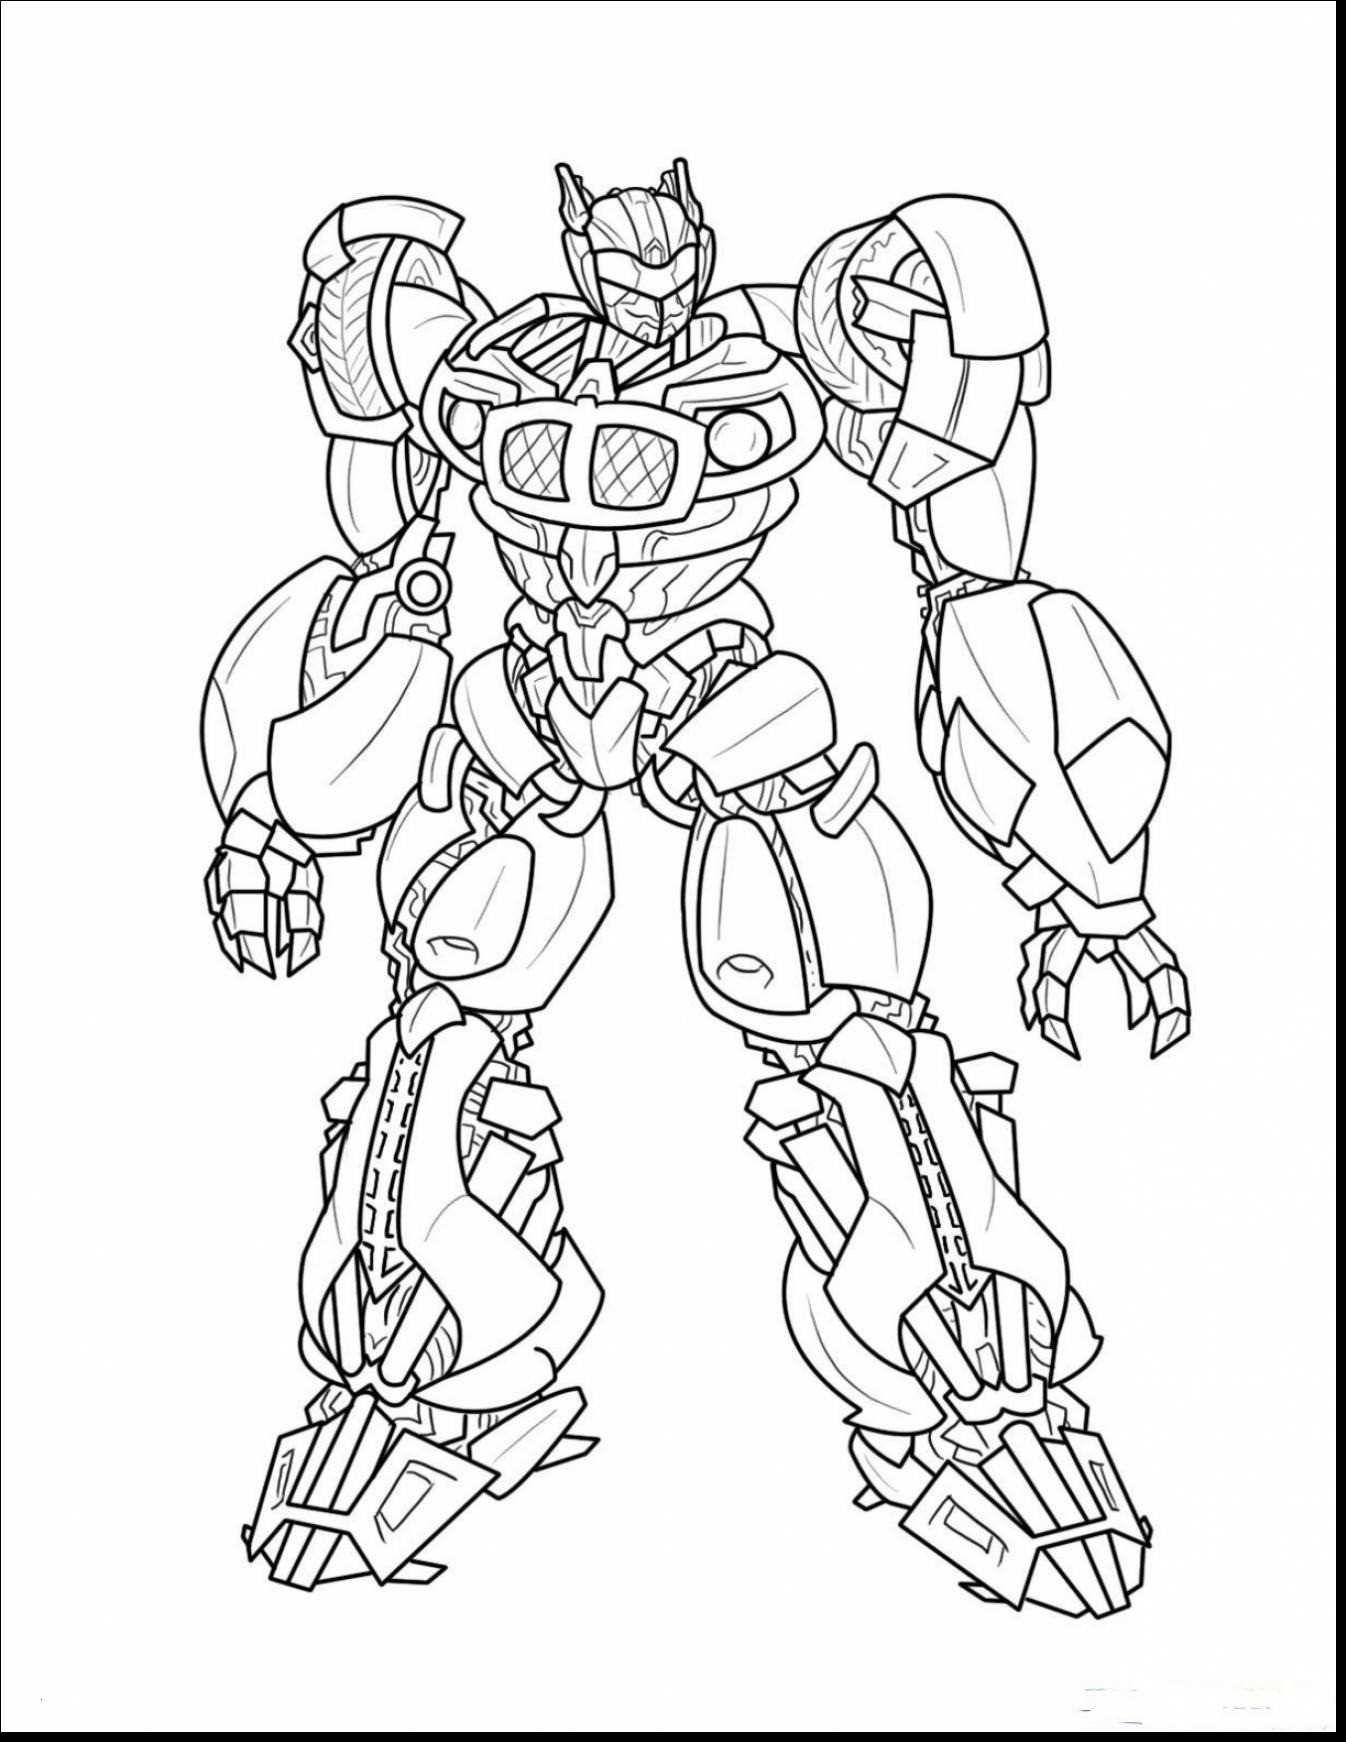 Transformers Optimus Prime Zum Ausmalen Bild 40 Best Transformers Propos Coloriage Transformers Optimus Prim Coloriage Transformers Dessin A Colorier Coloriage